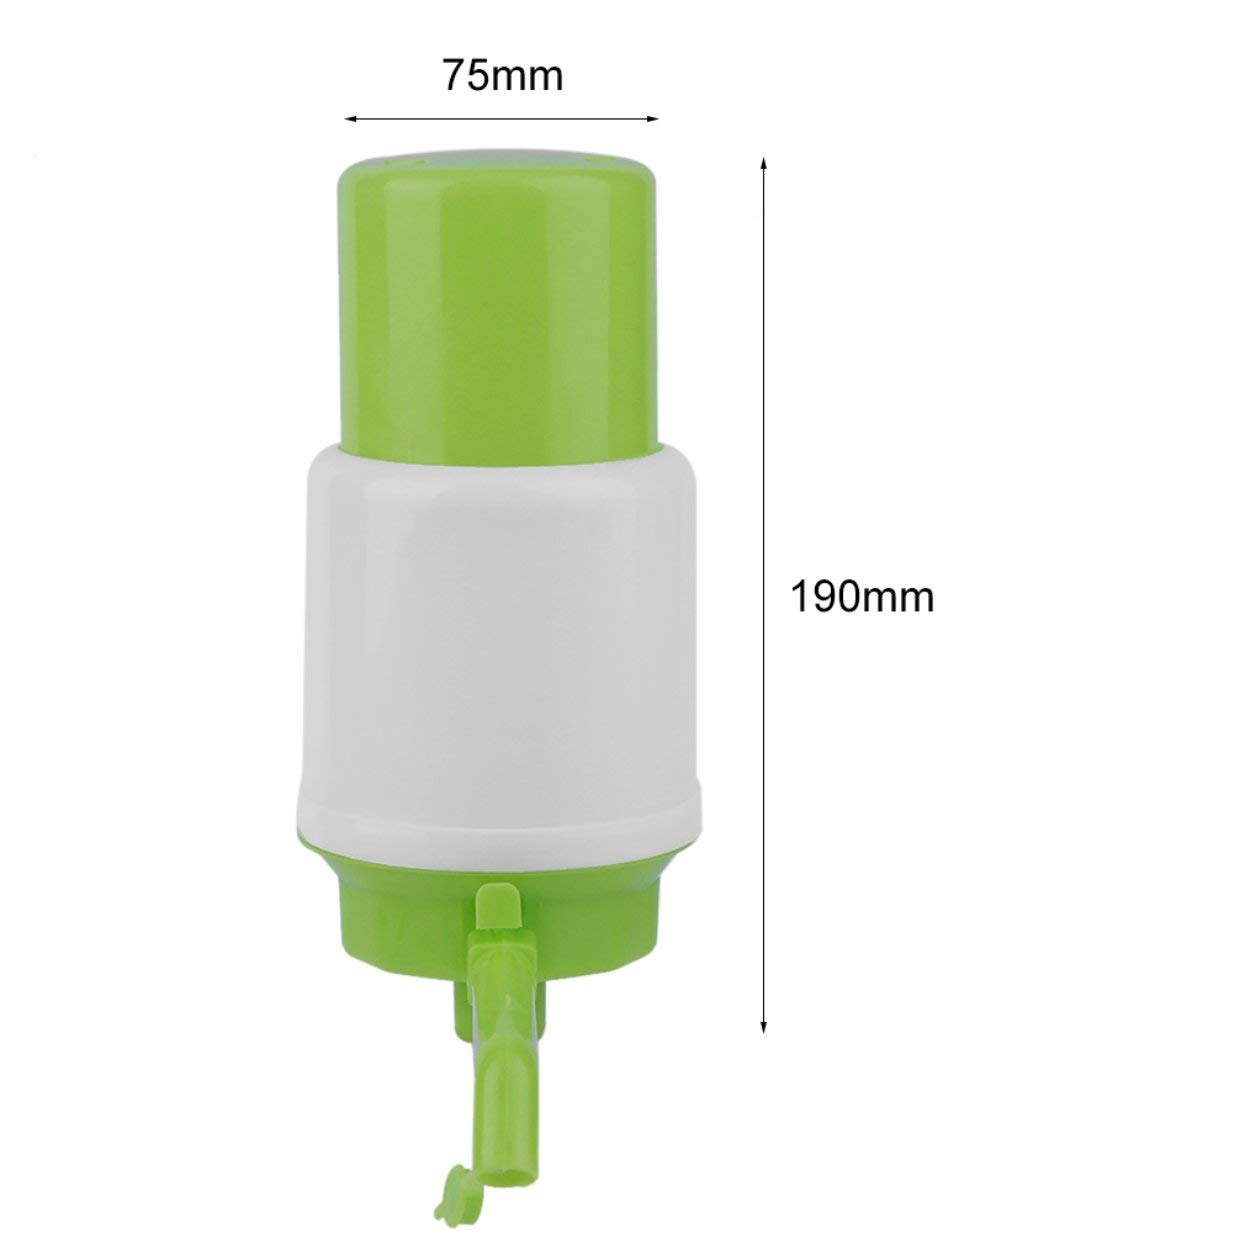 Tellaboull Per Gallon Bottled Potabile Pompa per Acqua Hand Press Pompa Manuale Dispenser Extensions Rimovibile Tube Pump Faucet Tool